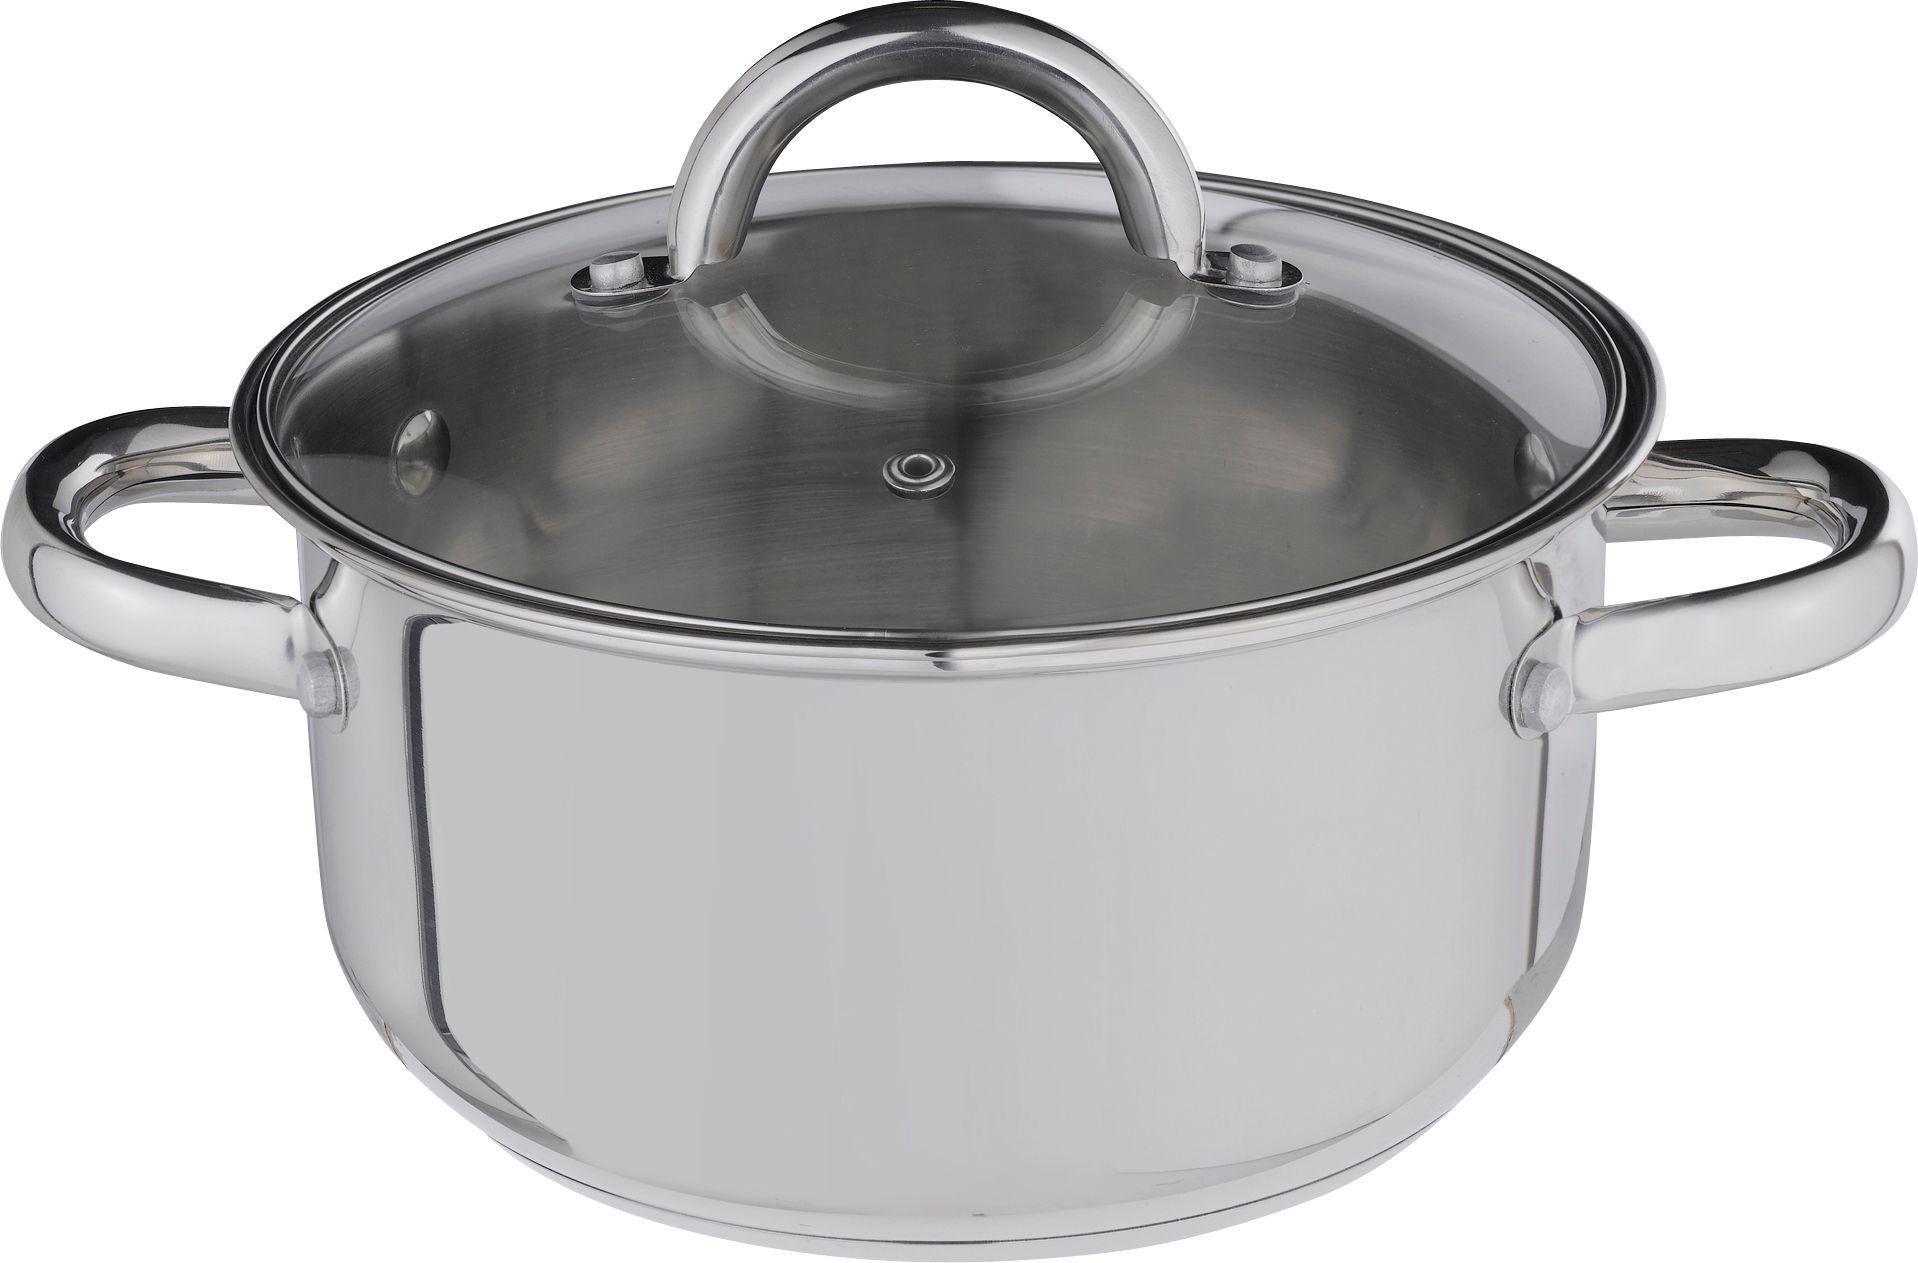 Argos Home 20cm Stainless Steel Casserole Pot